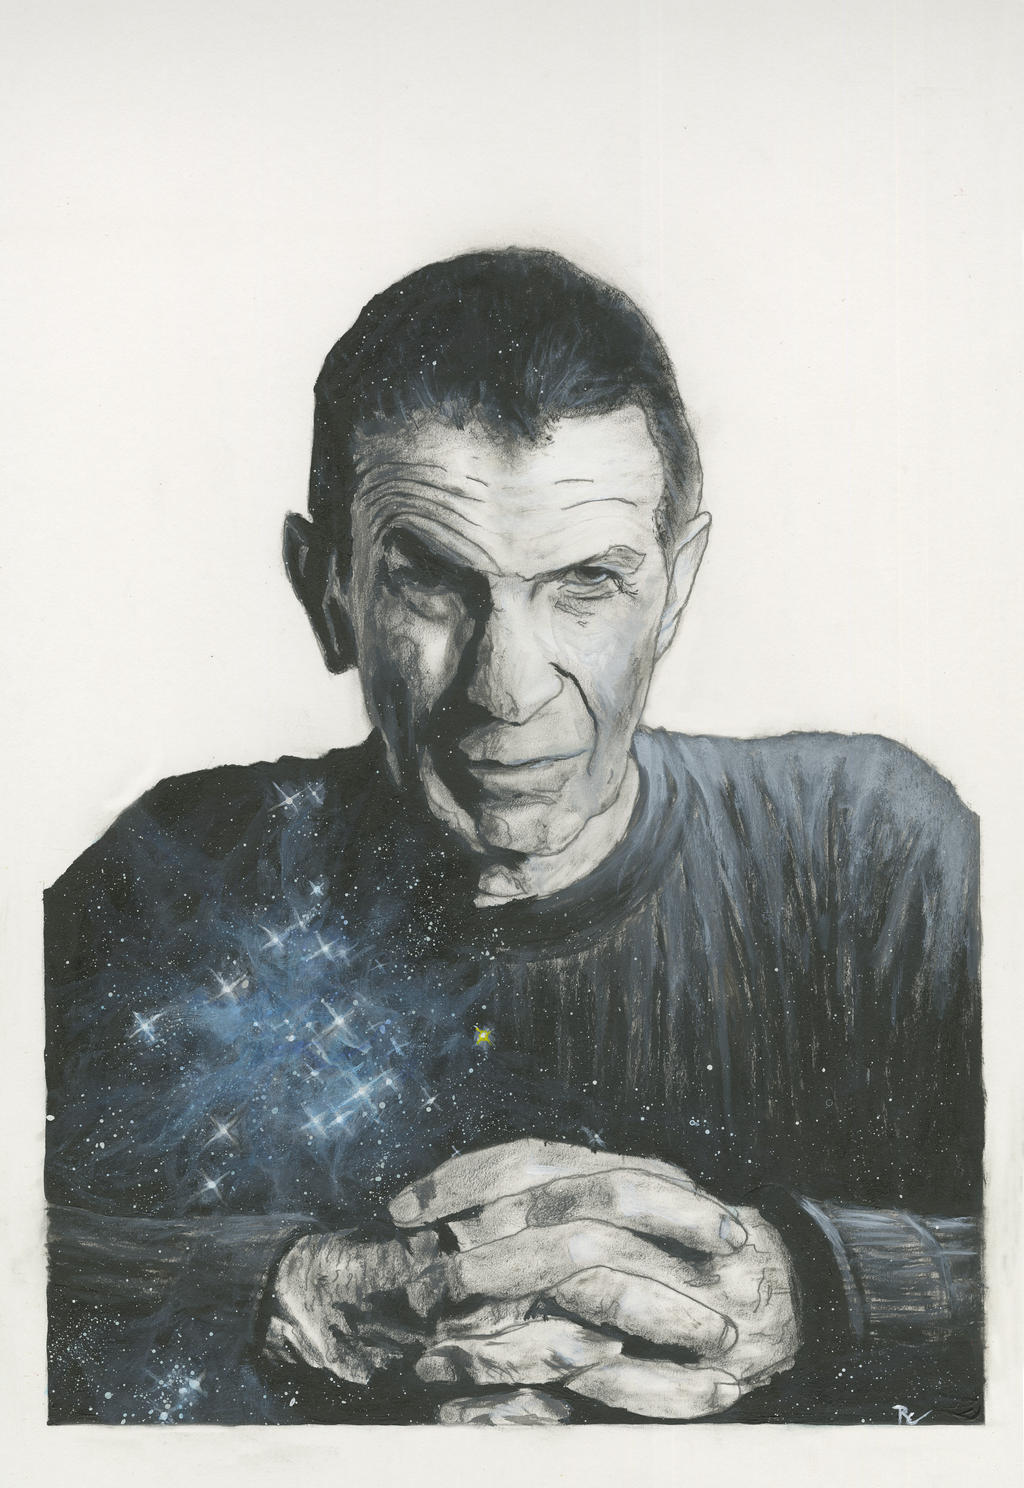 A True Starman - Leonard Nimoy Painting